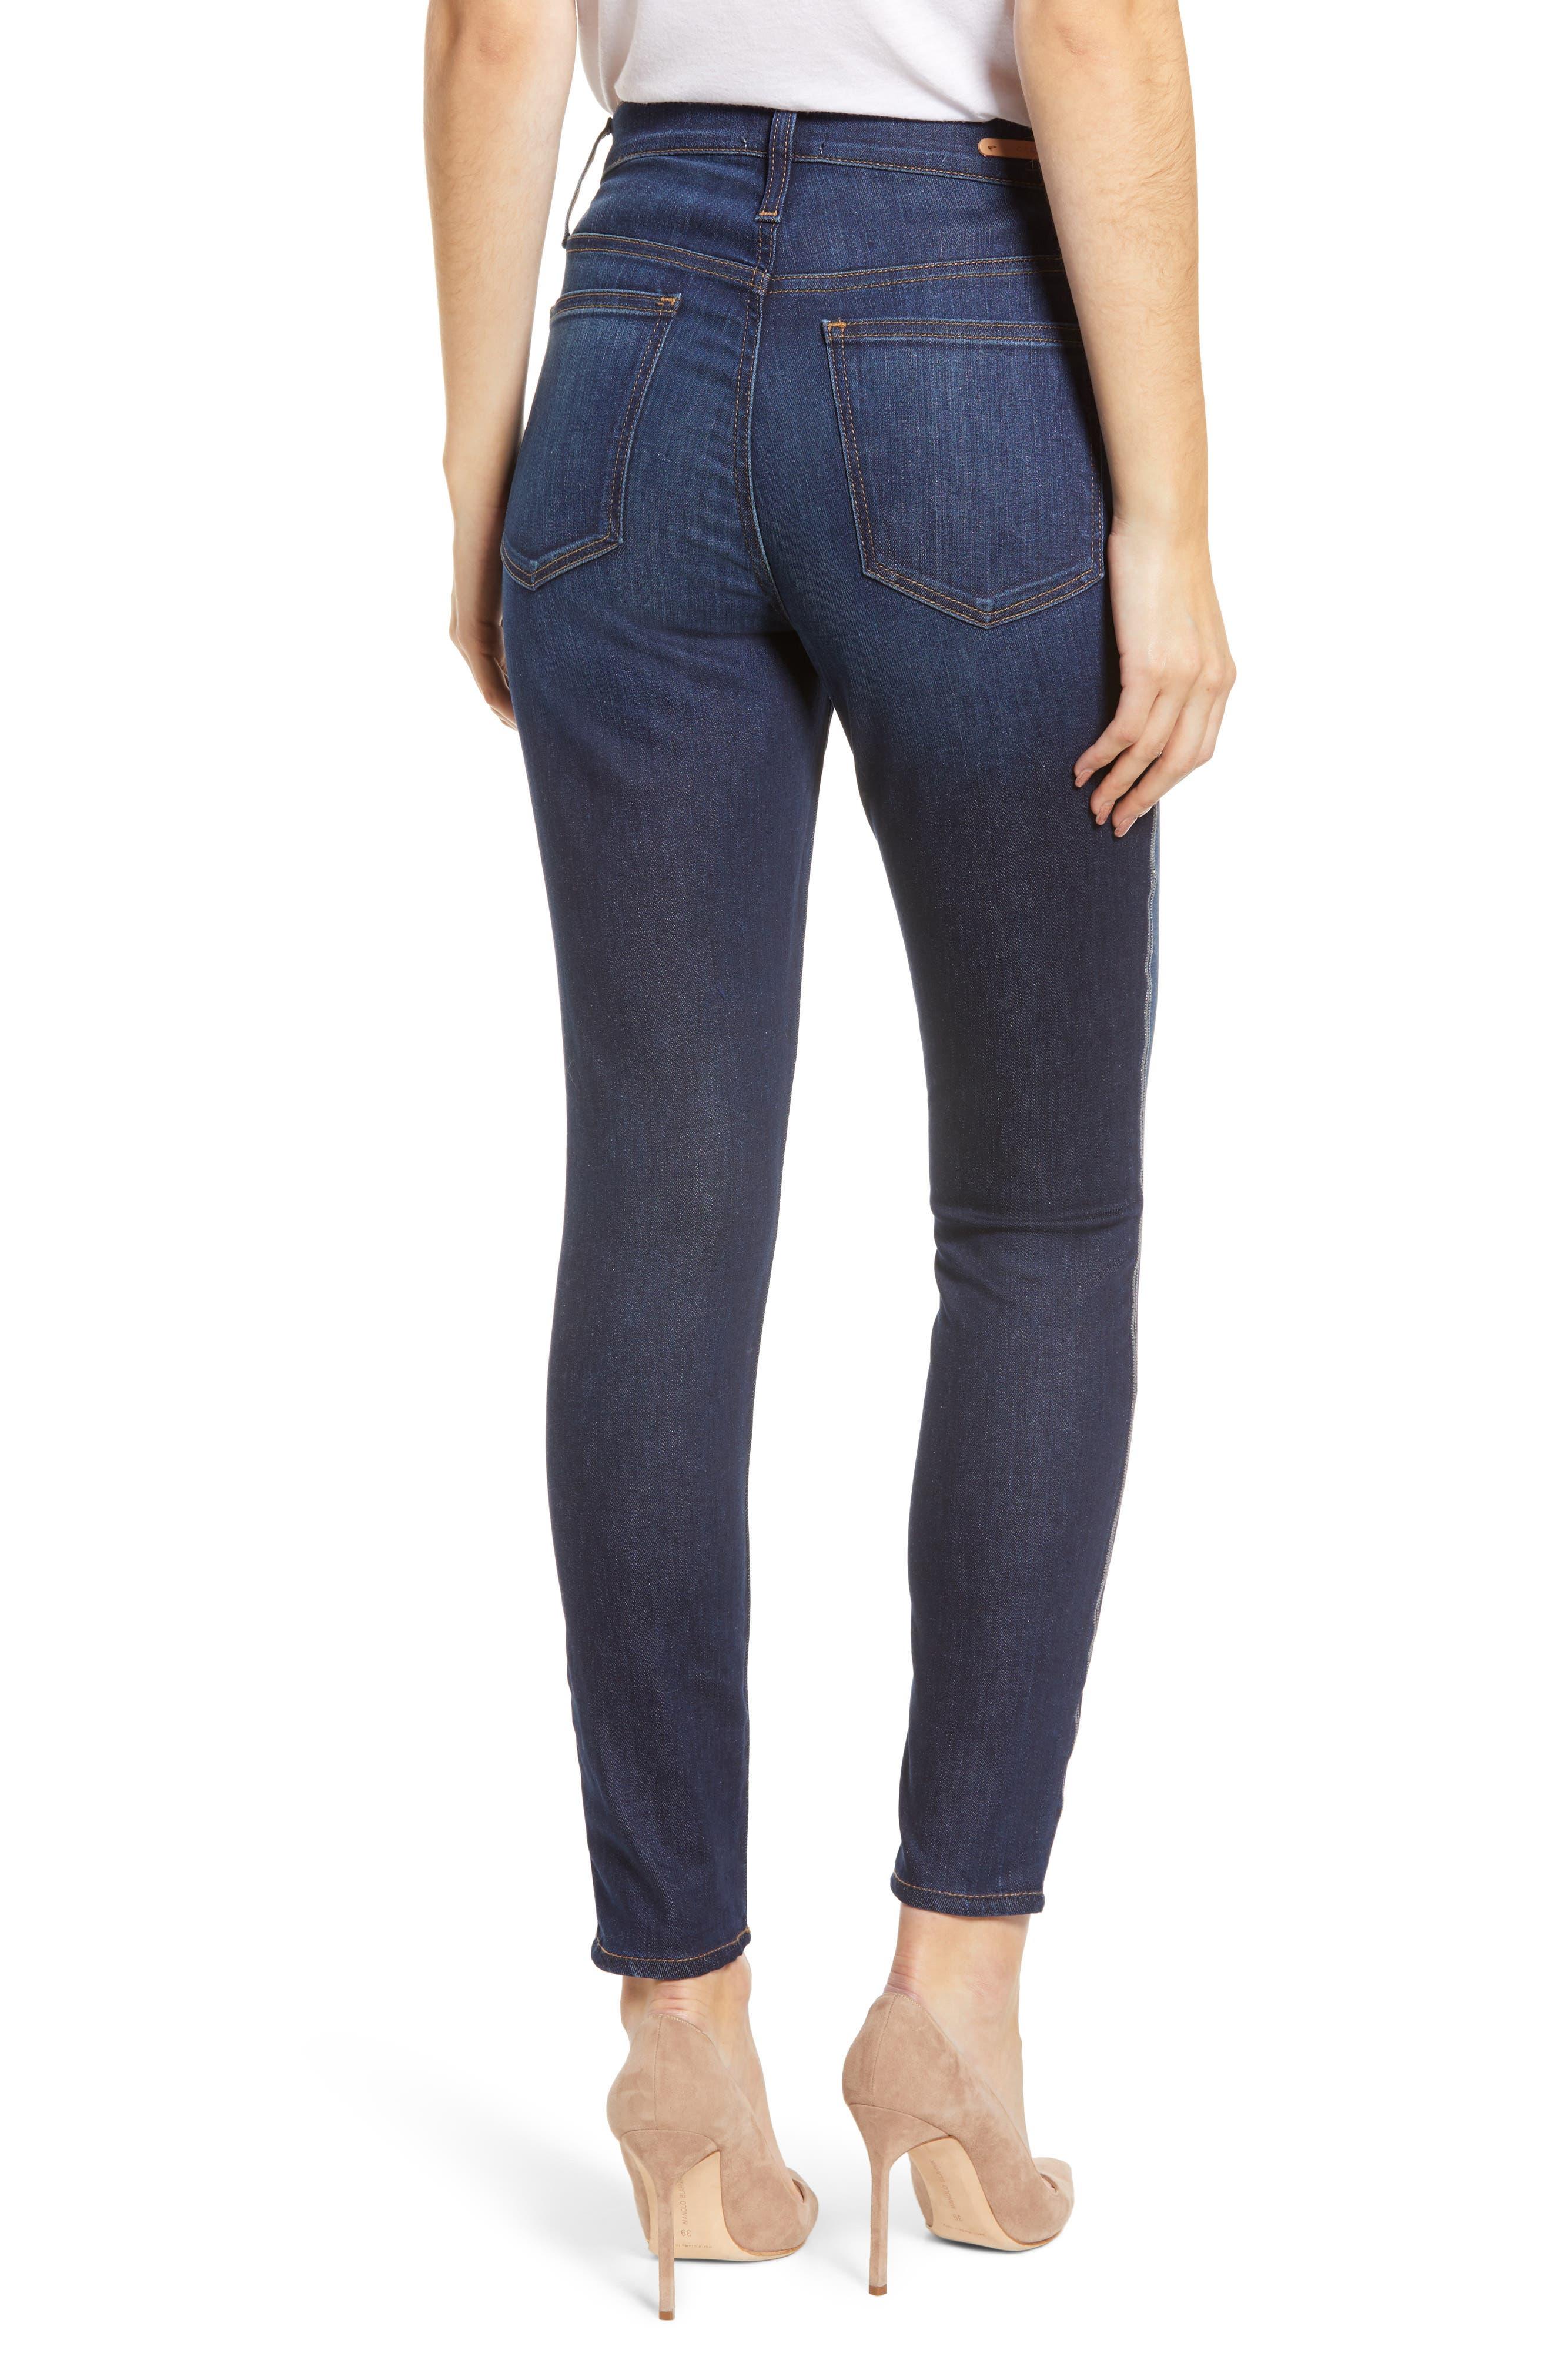 Sierra High Waist Ankle Skinny Jeans,                             Alternate thumbnail 2, color,                             FRANCIS